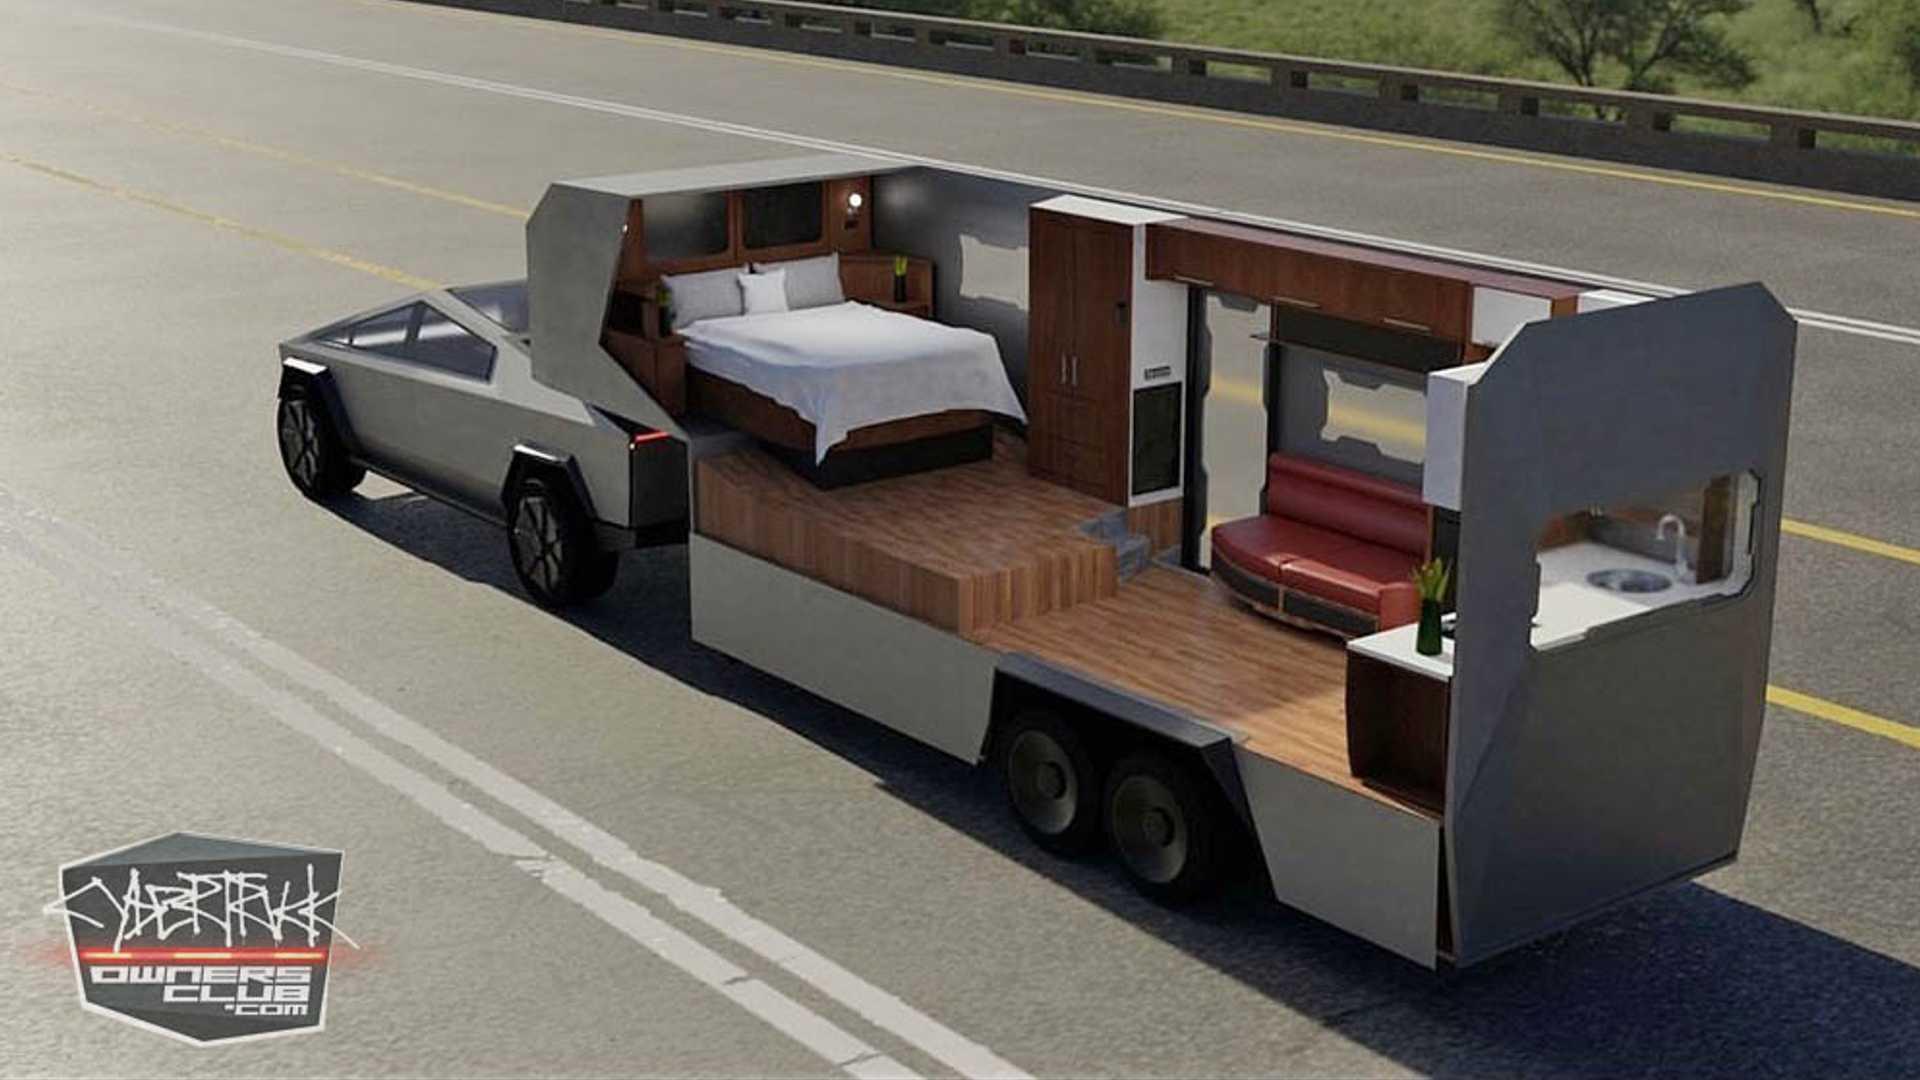 Tesla Custom RVs The Tiny Home Of Our Dreams